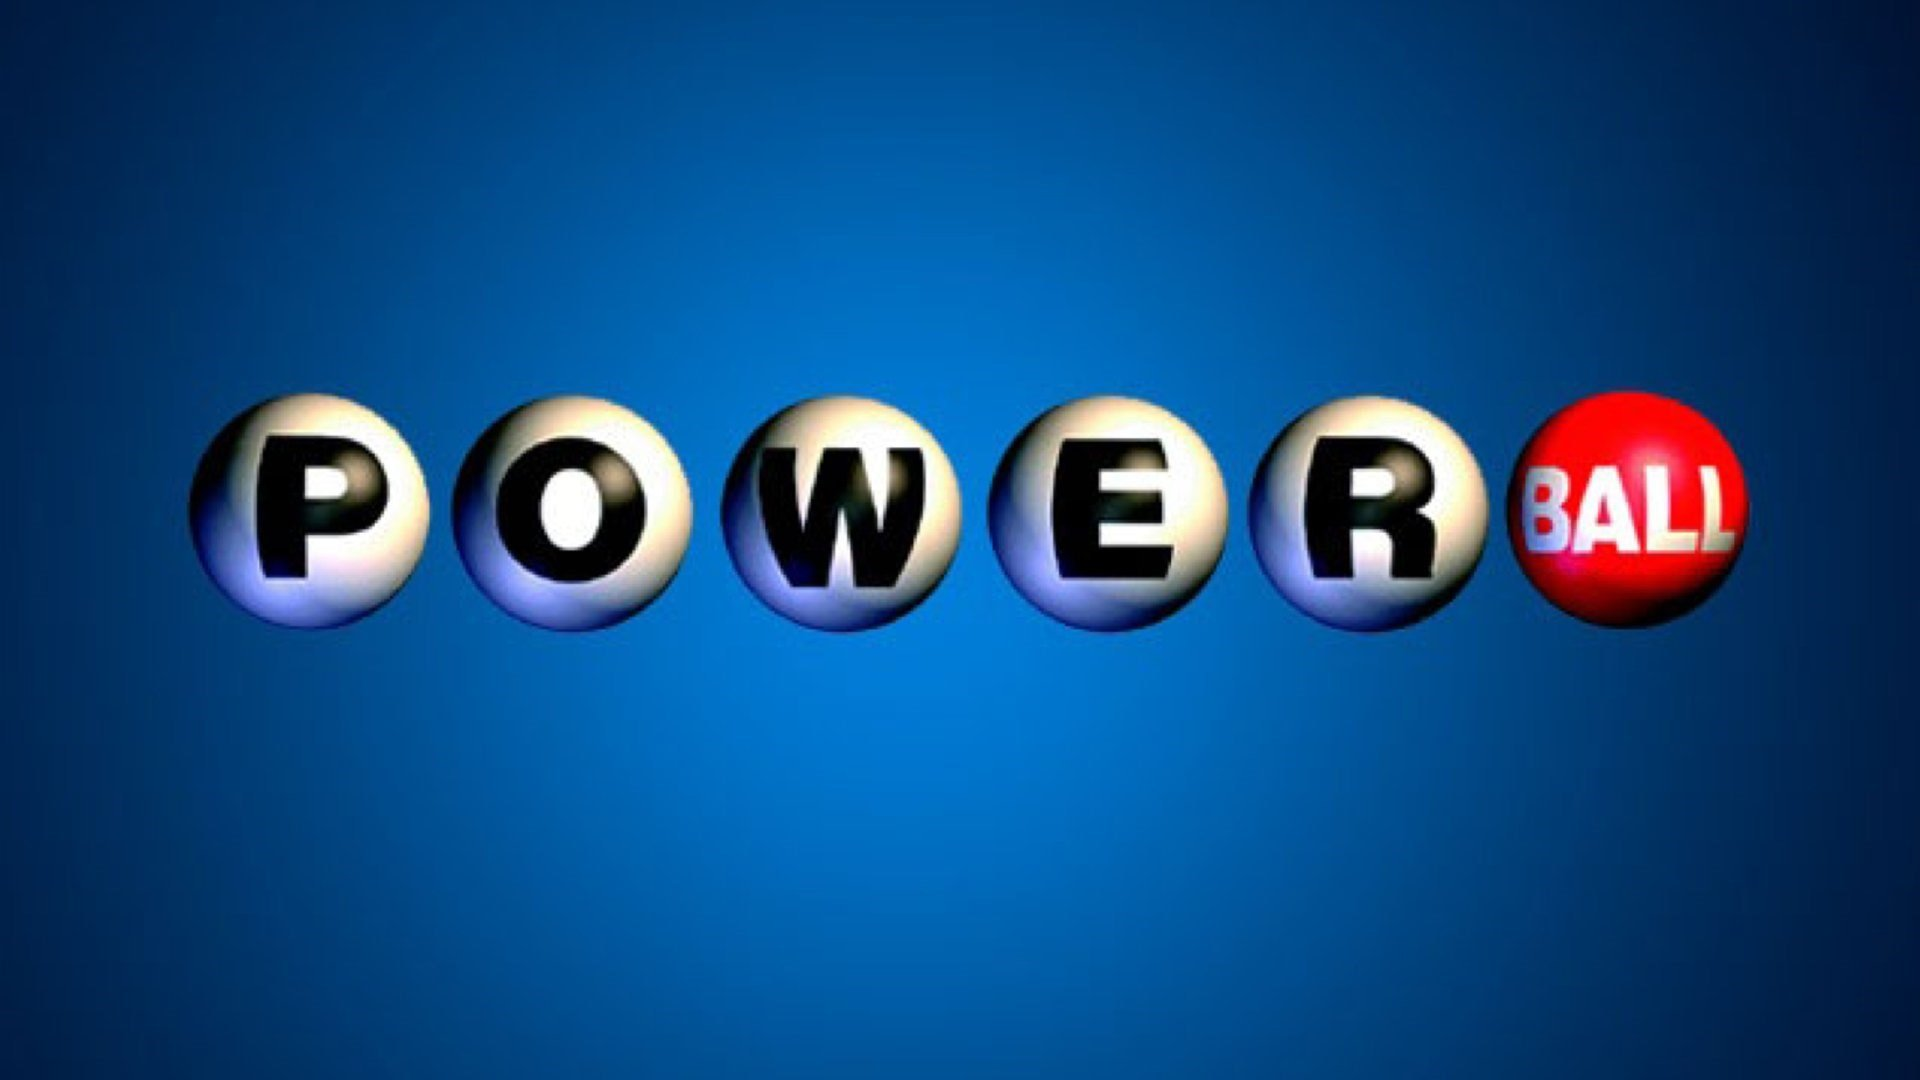 Powerball Jackpot Reaches $650 Million